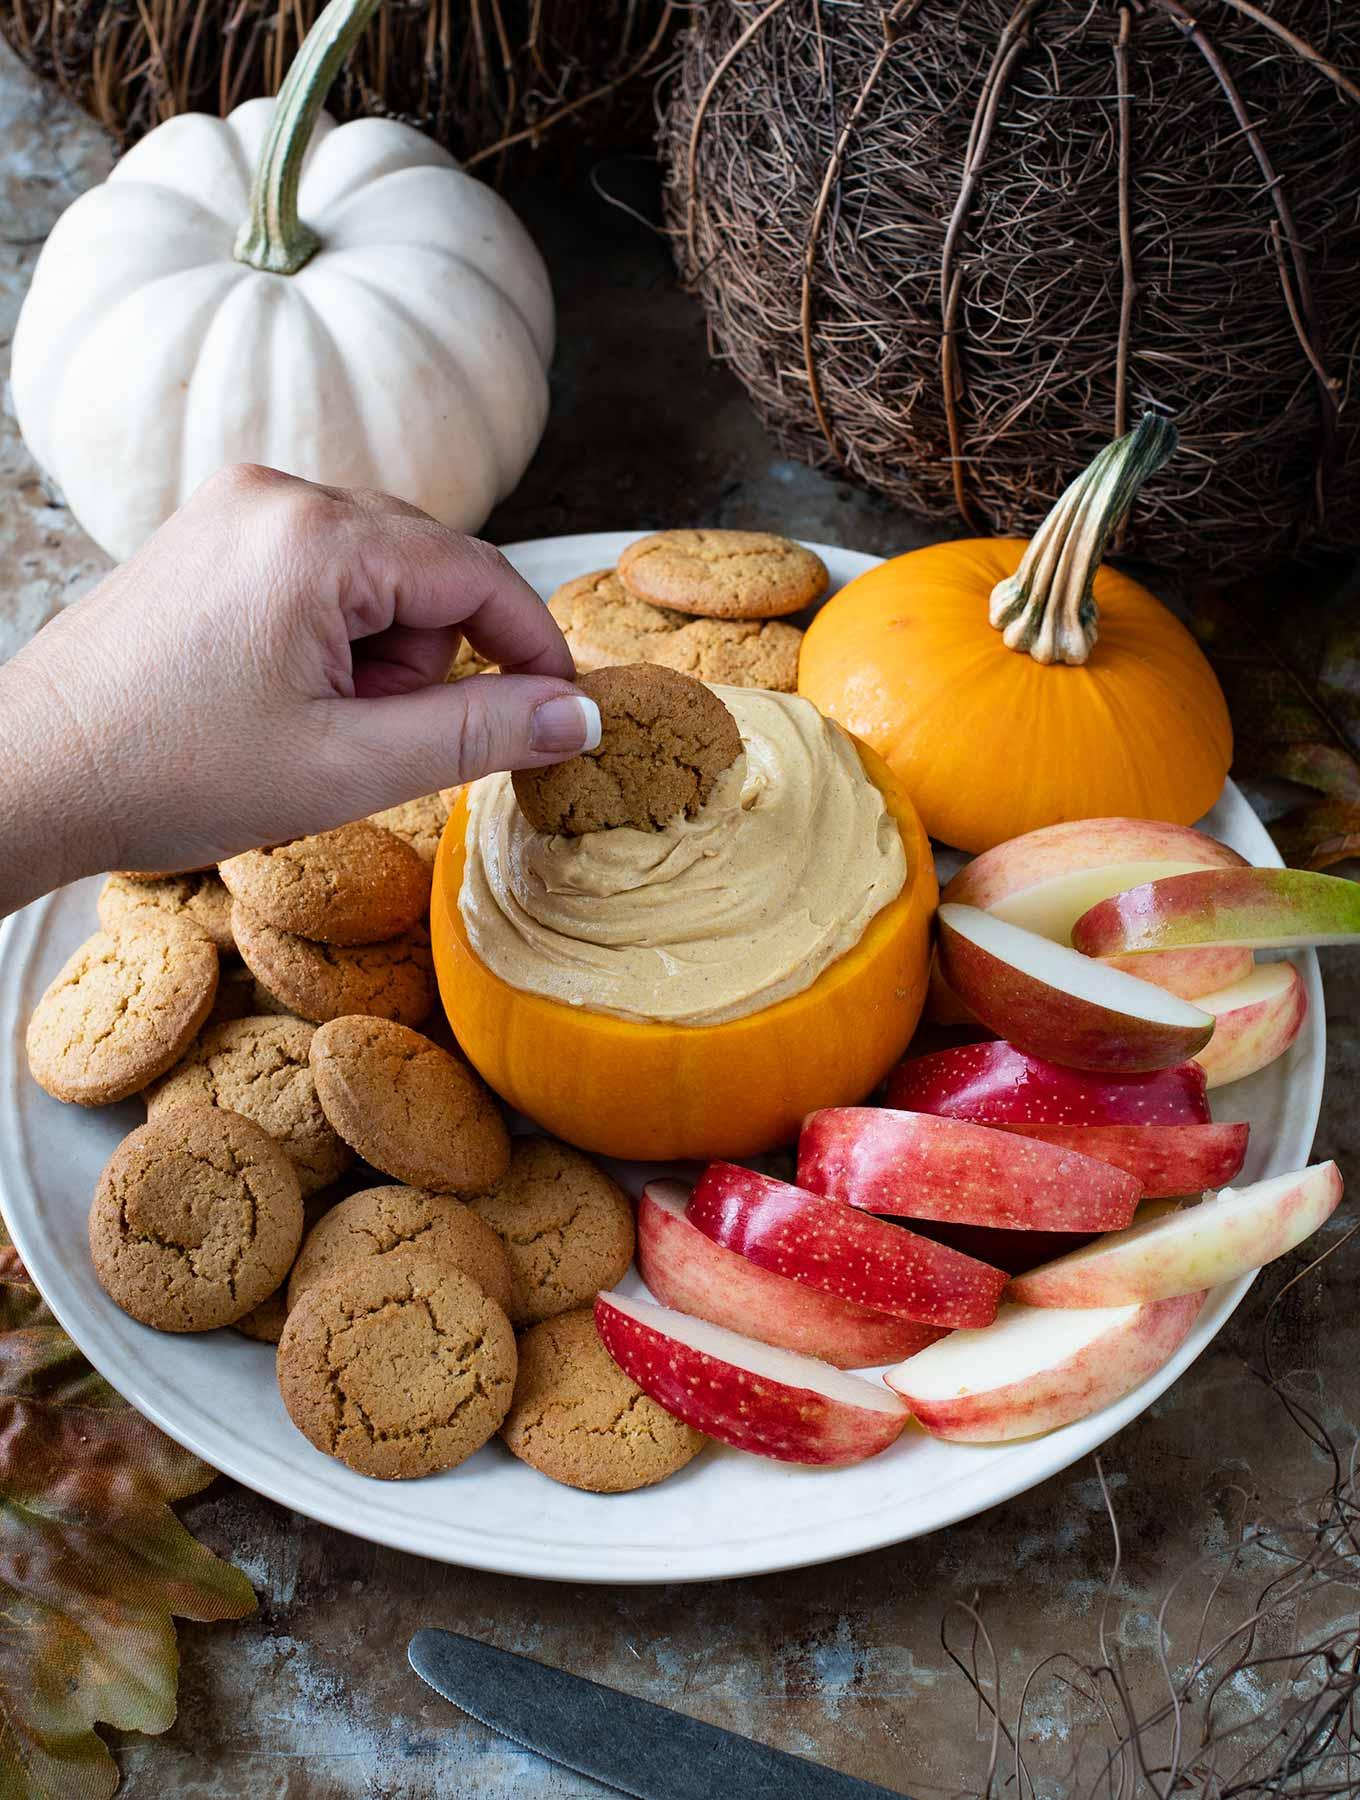 pumpkin cream cheese dip with apples